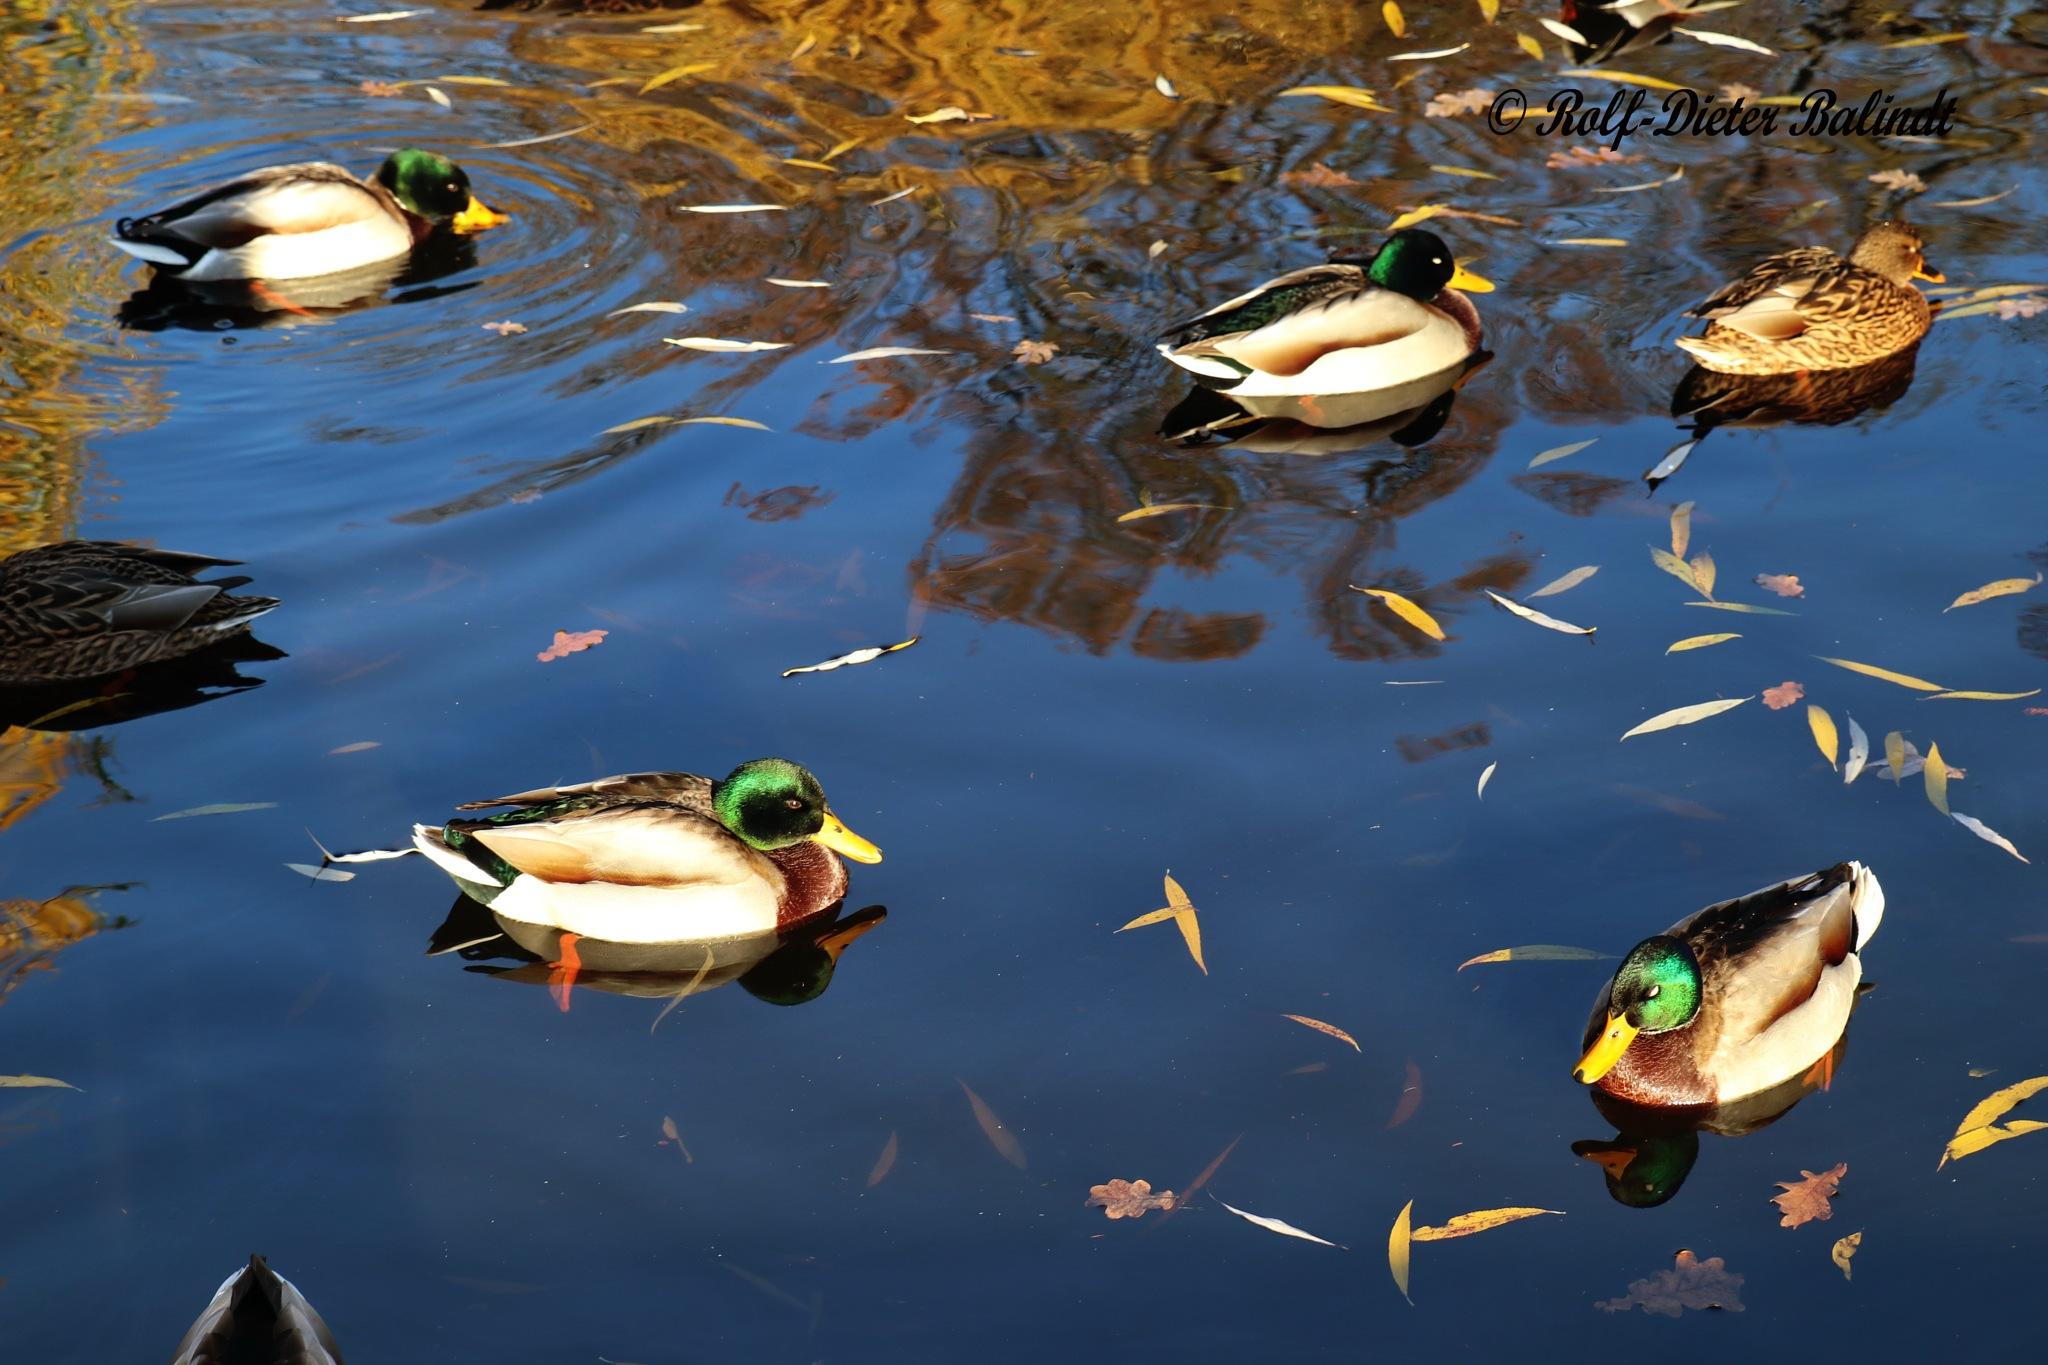 Ducks / Enten by Rolf-Dieter Balindt